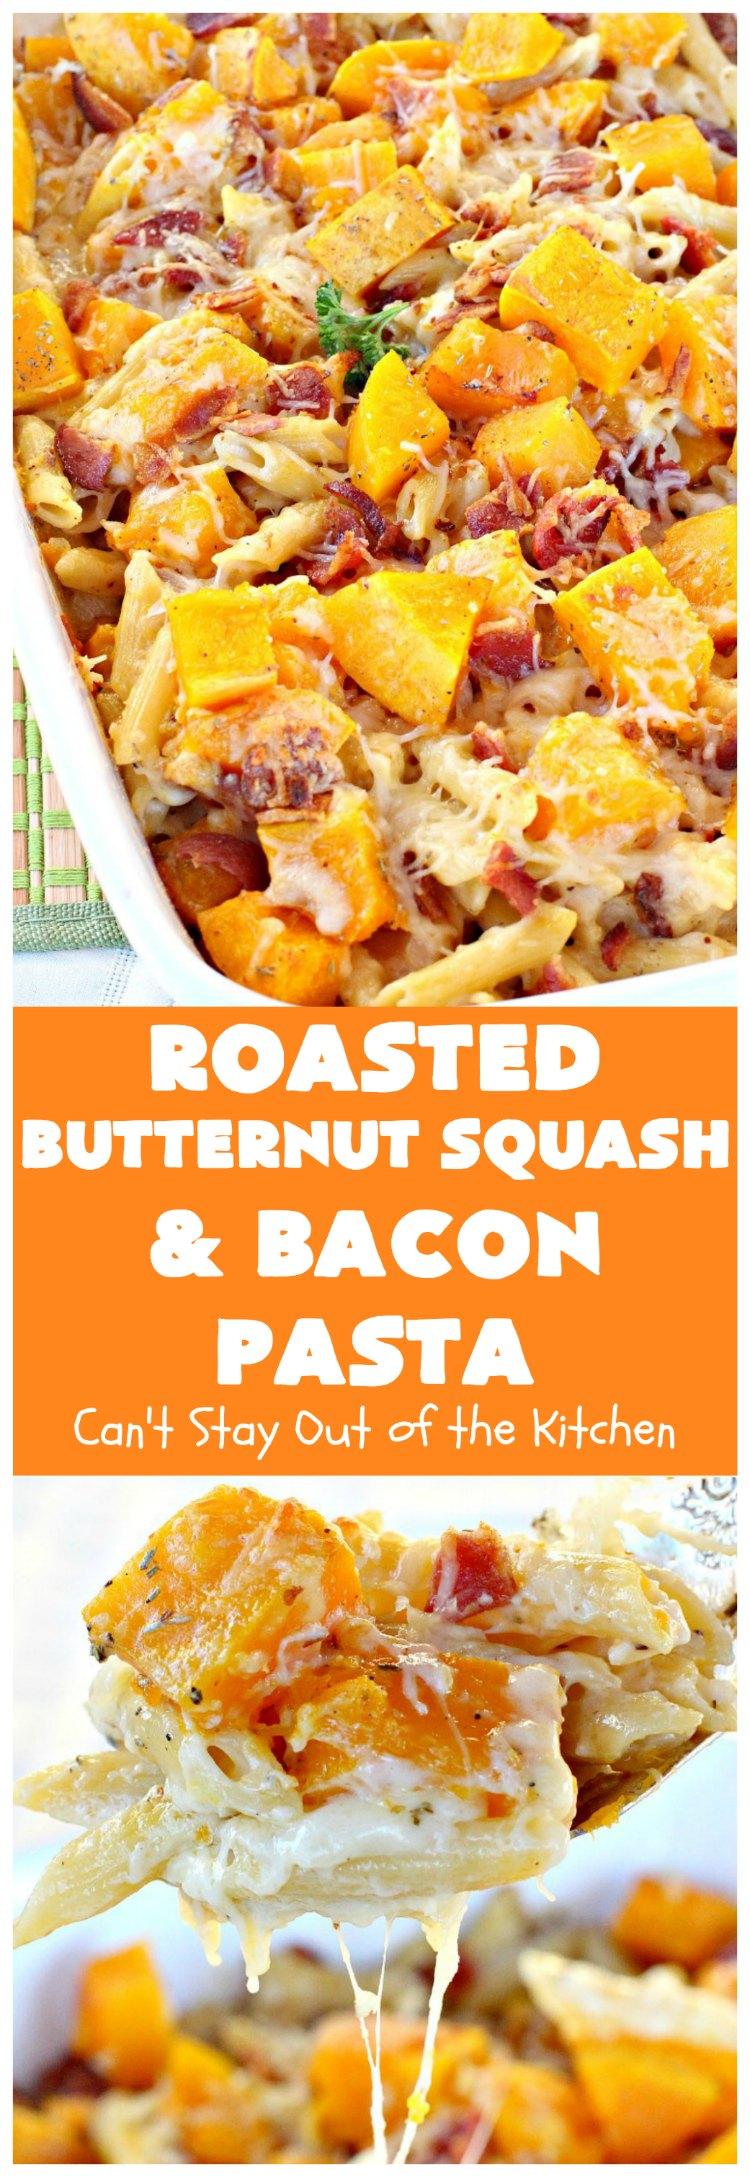 chicken alfredo butternut squash pasta bake - can't stay